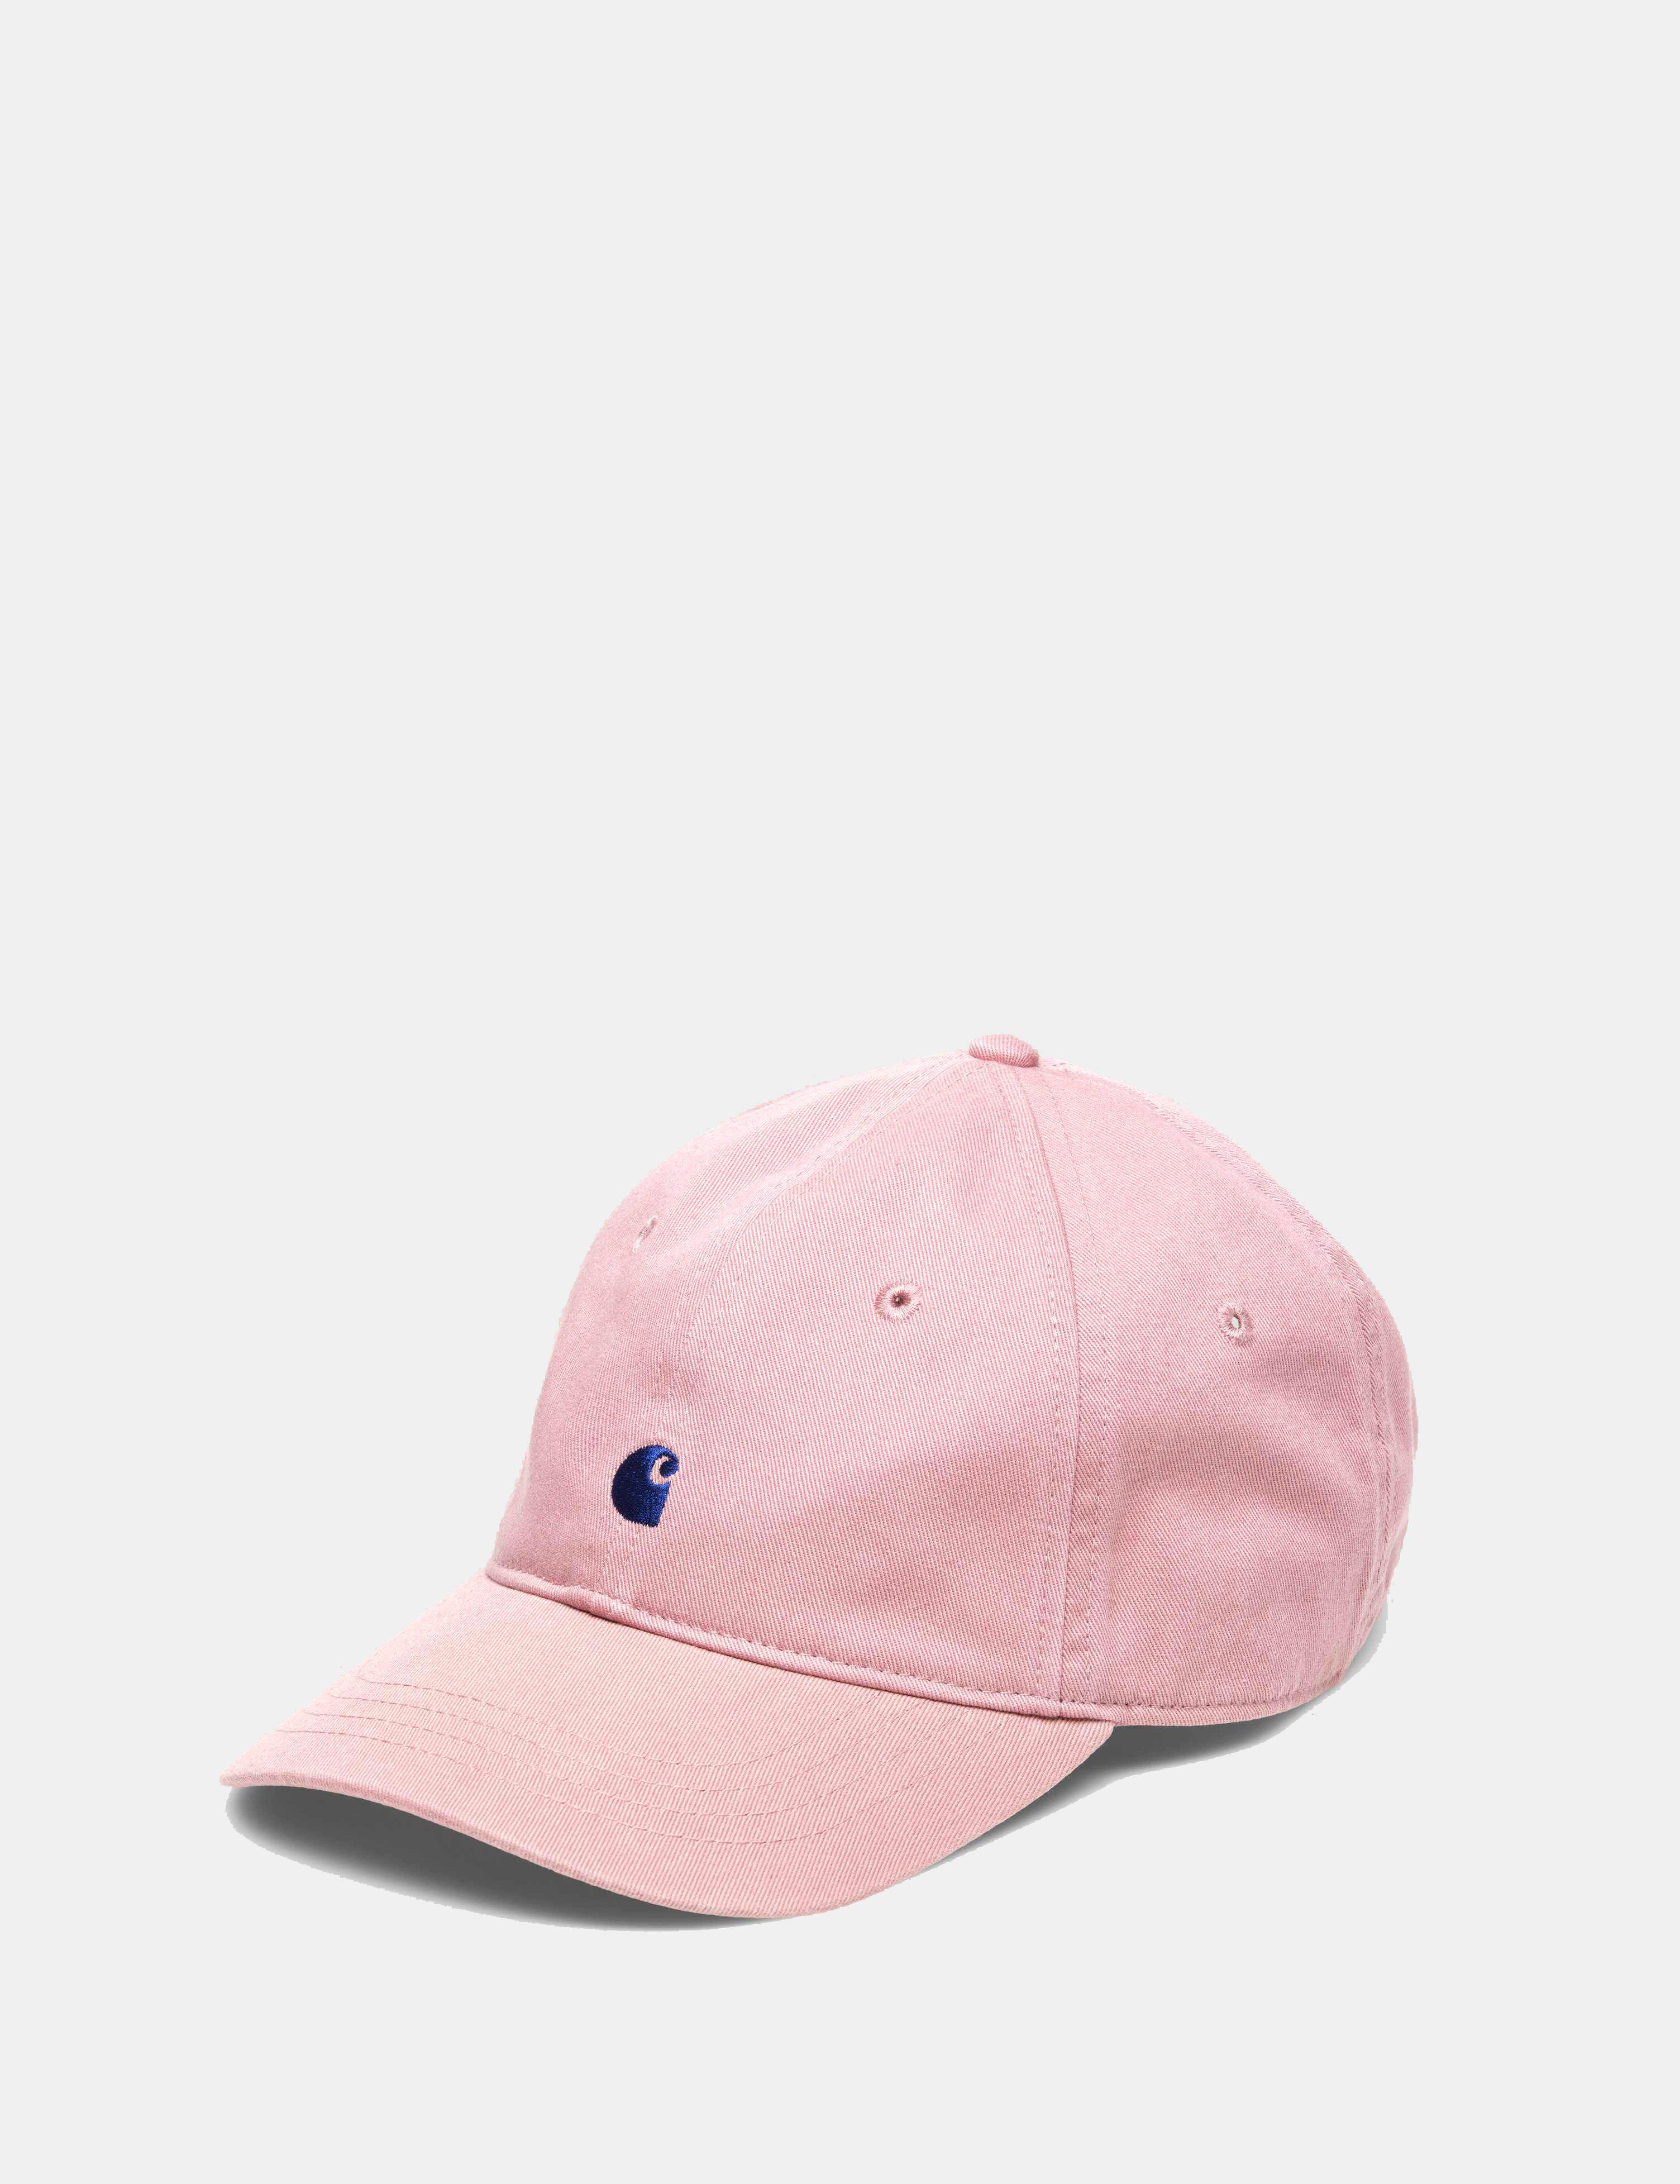 787470d00d4 Carhartt Madison Logo Dad Cap in Pink for Men - Lyst